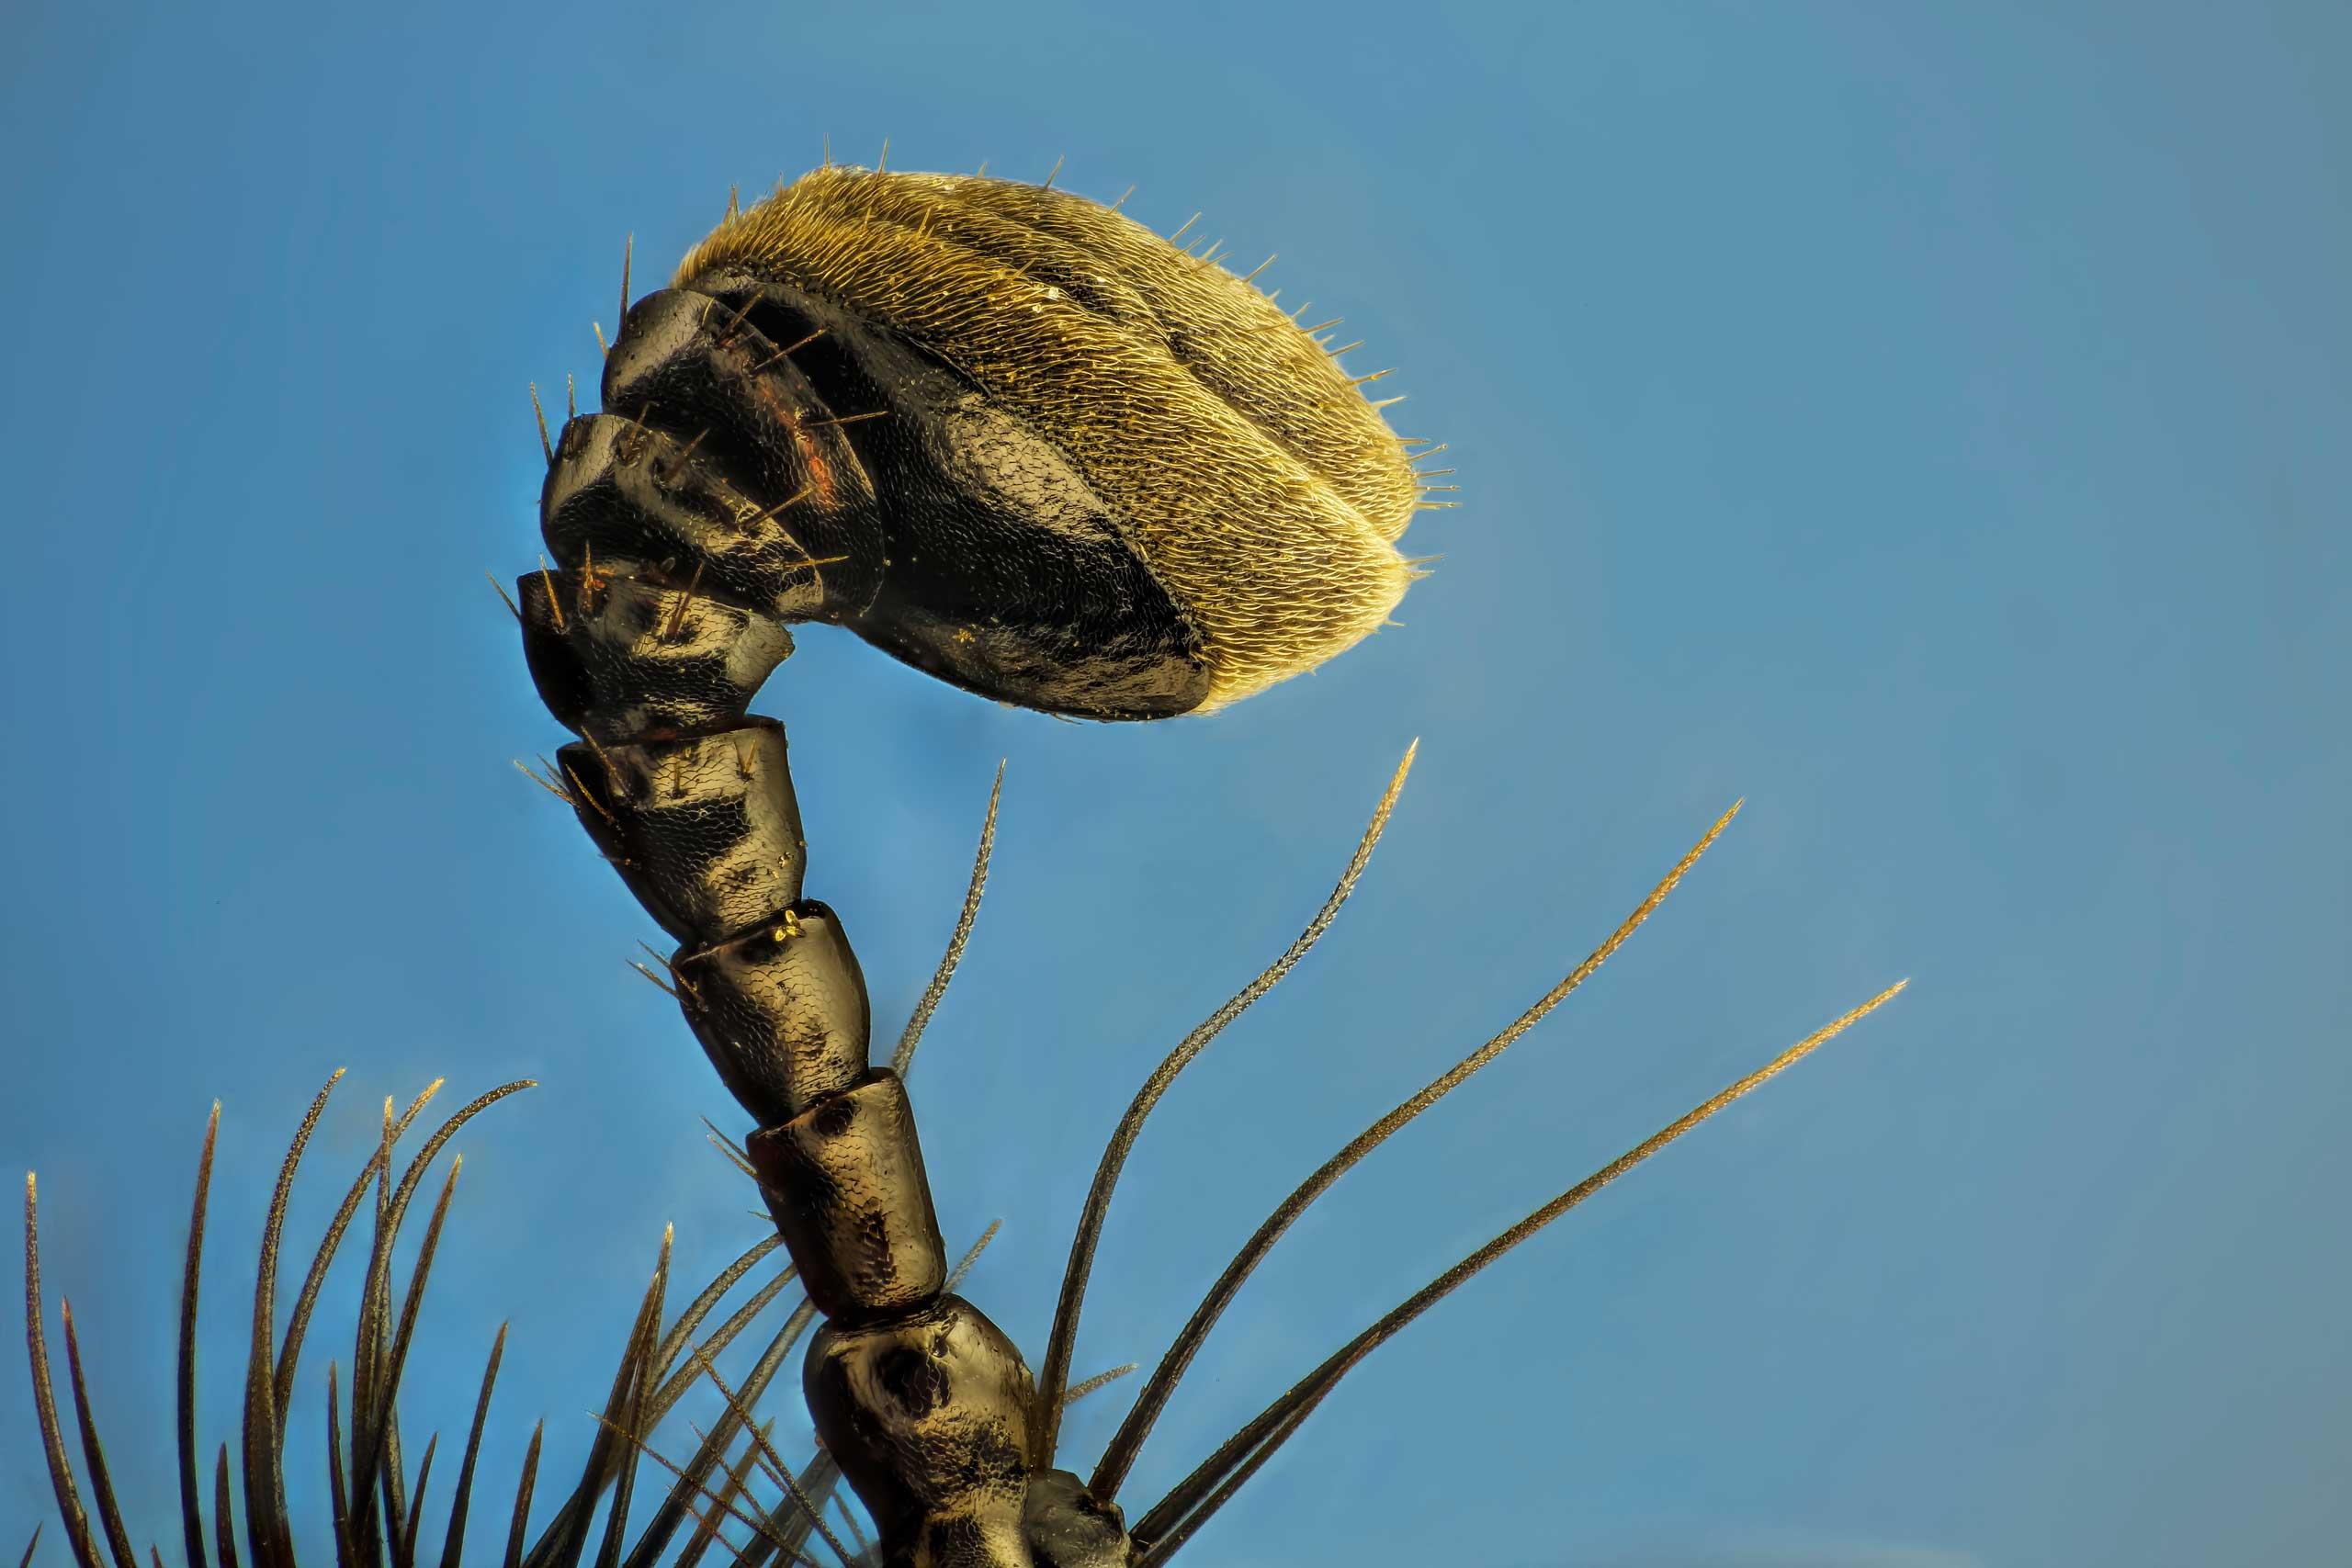 An earth-boring dung beetle.